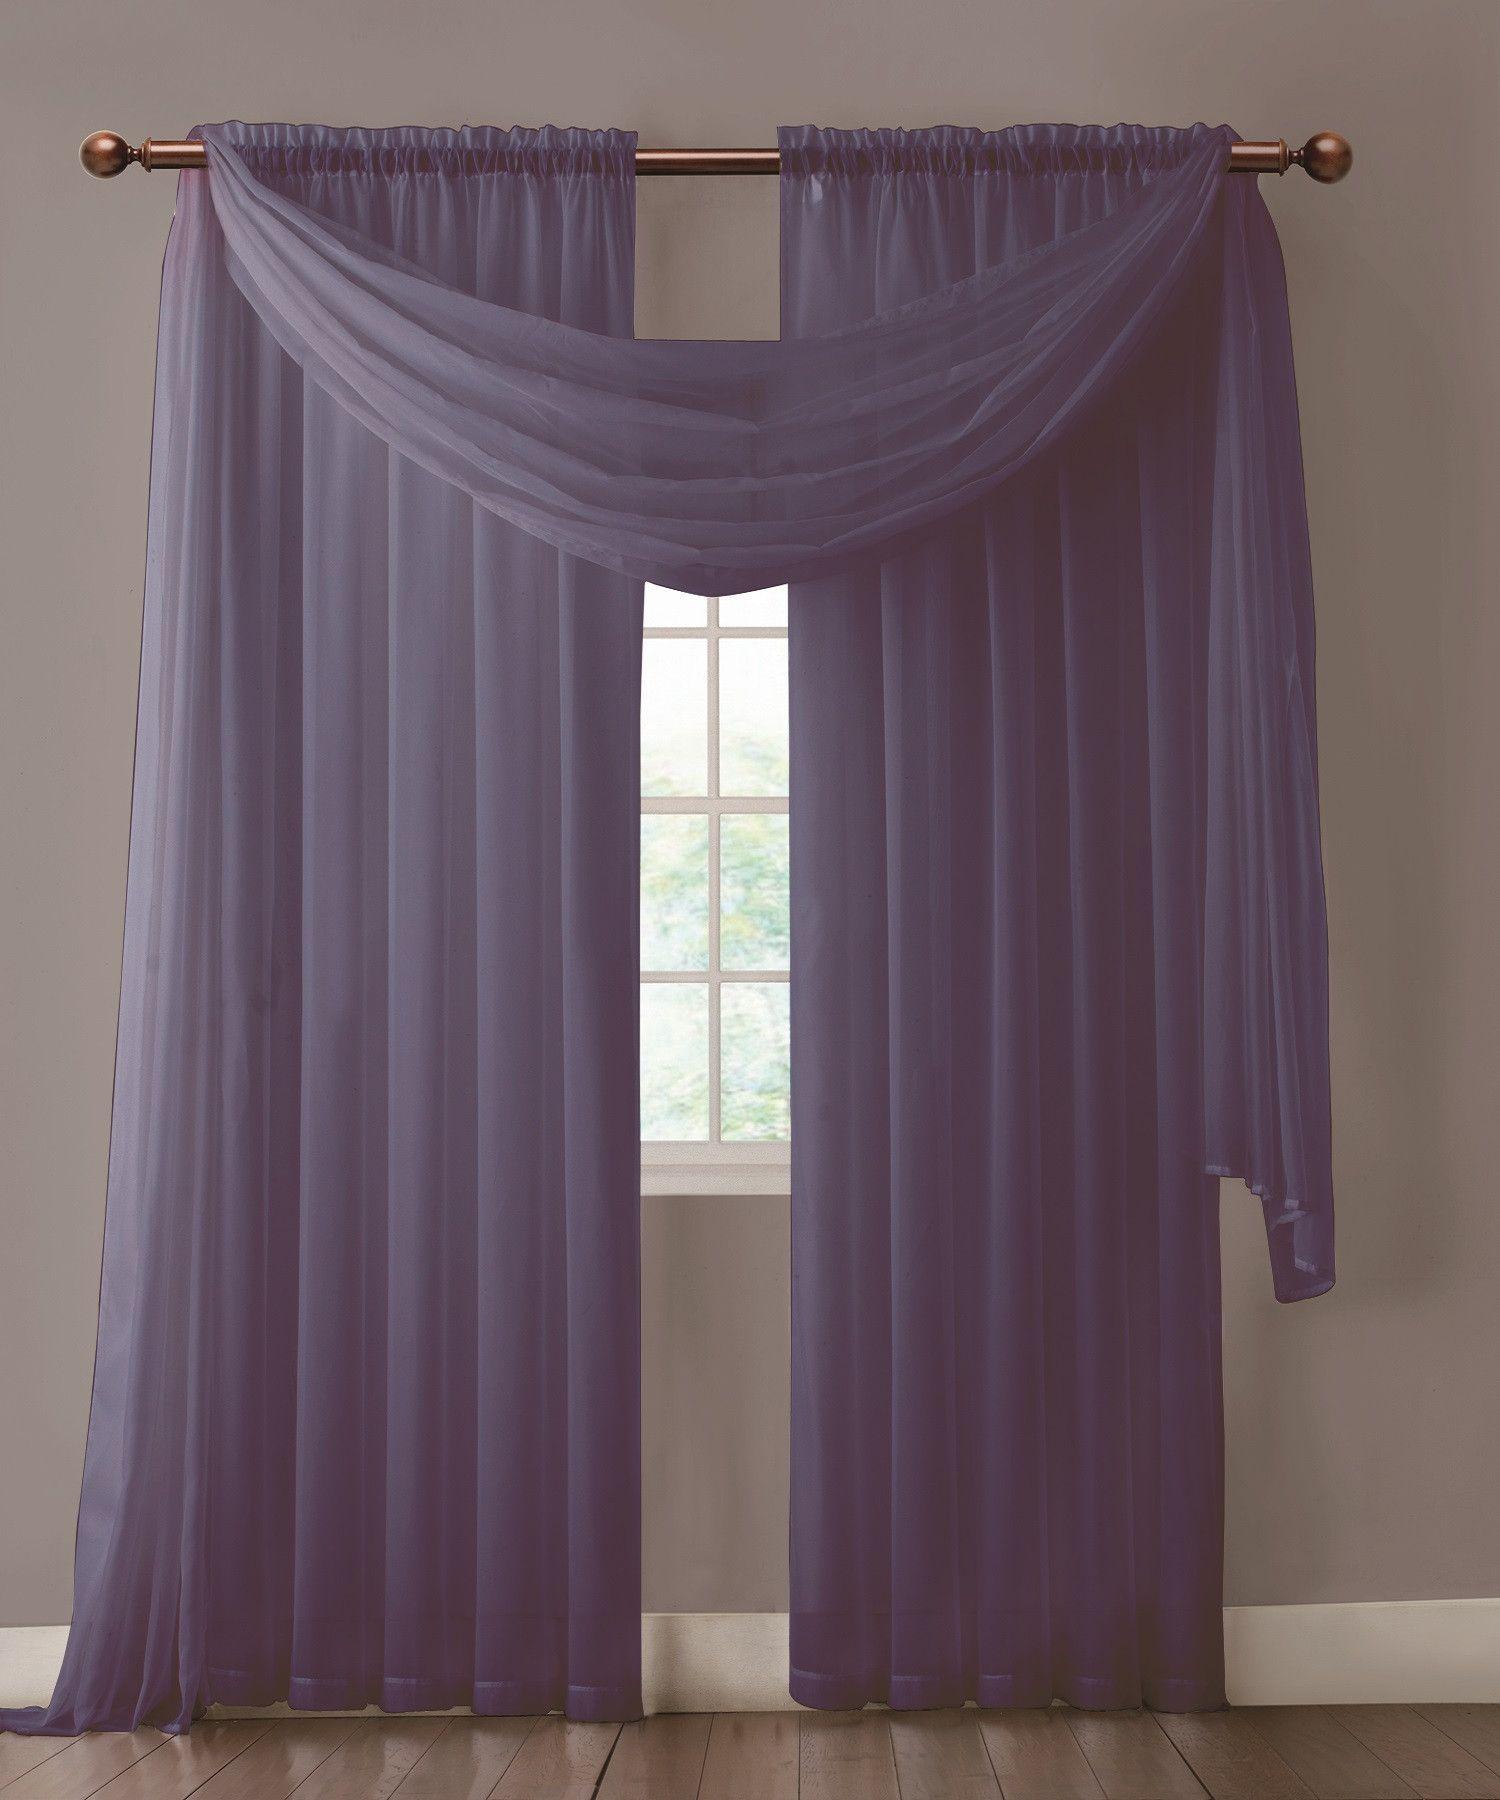 Warm Home Designs Pair Of Indigo Navy Blue Sheer Curtains Or